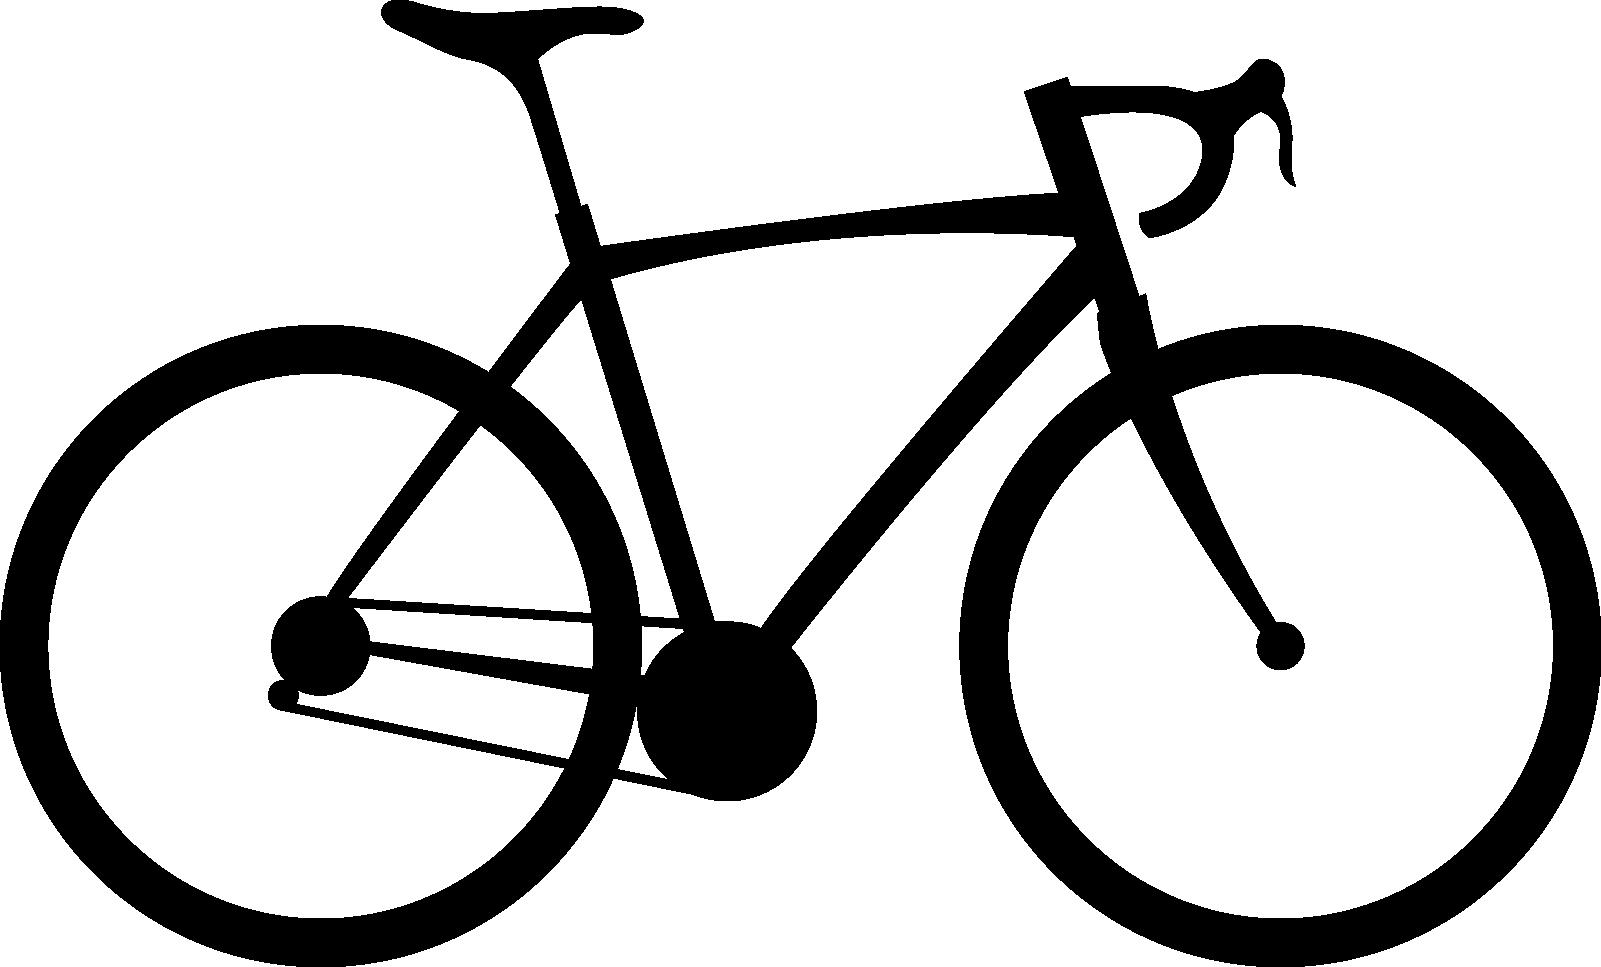 png transparent stock cUNRMPQ